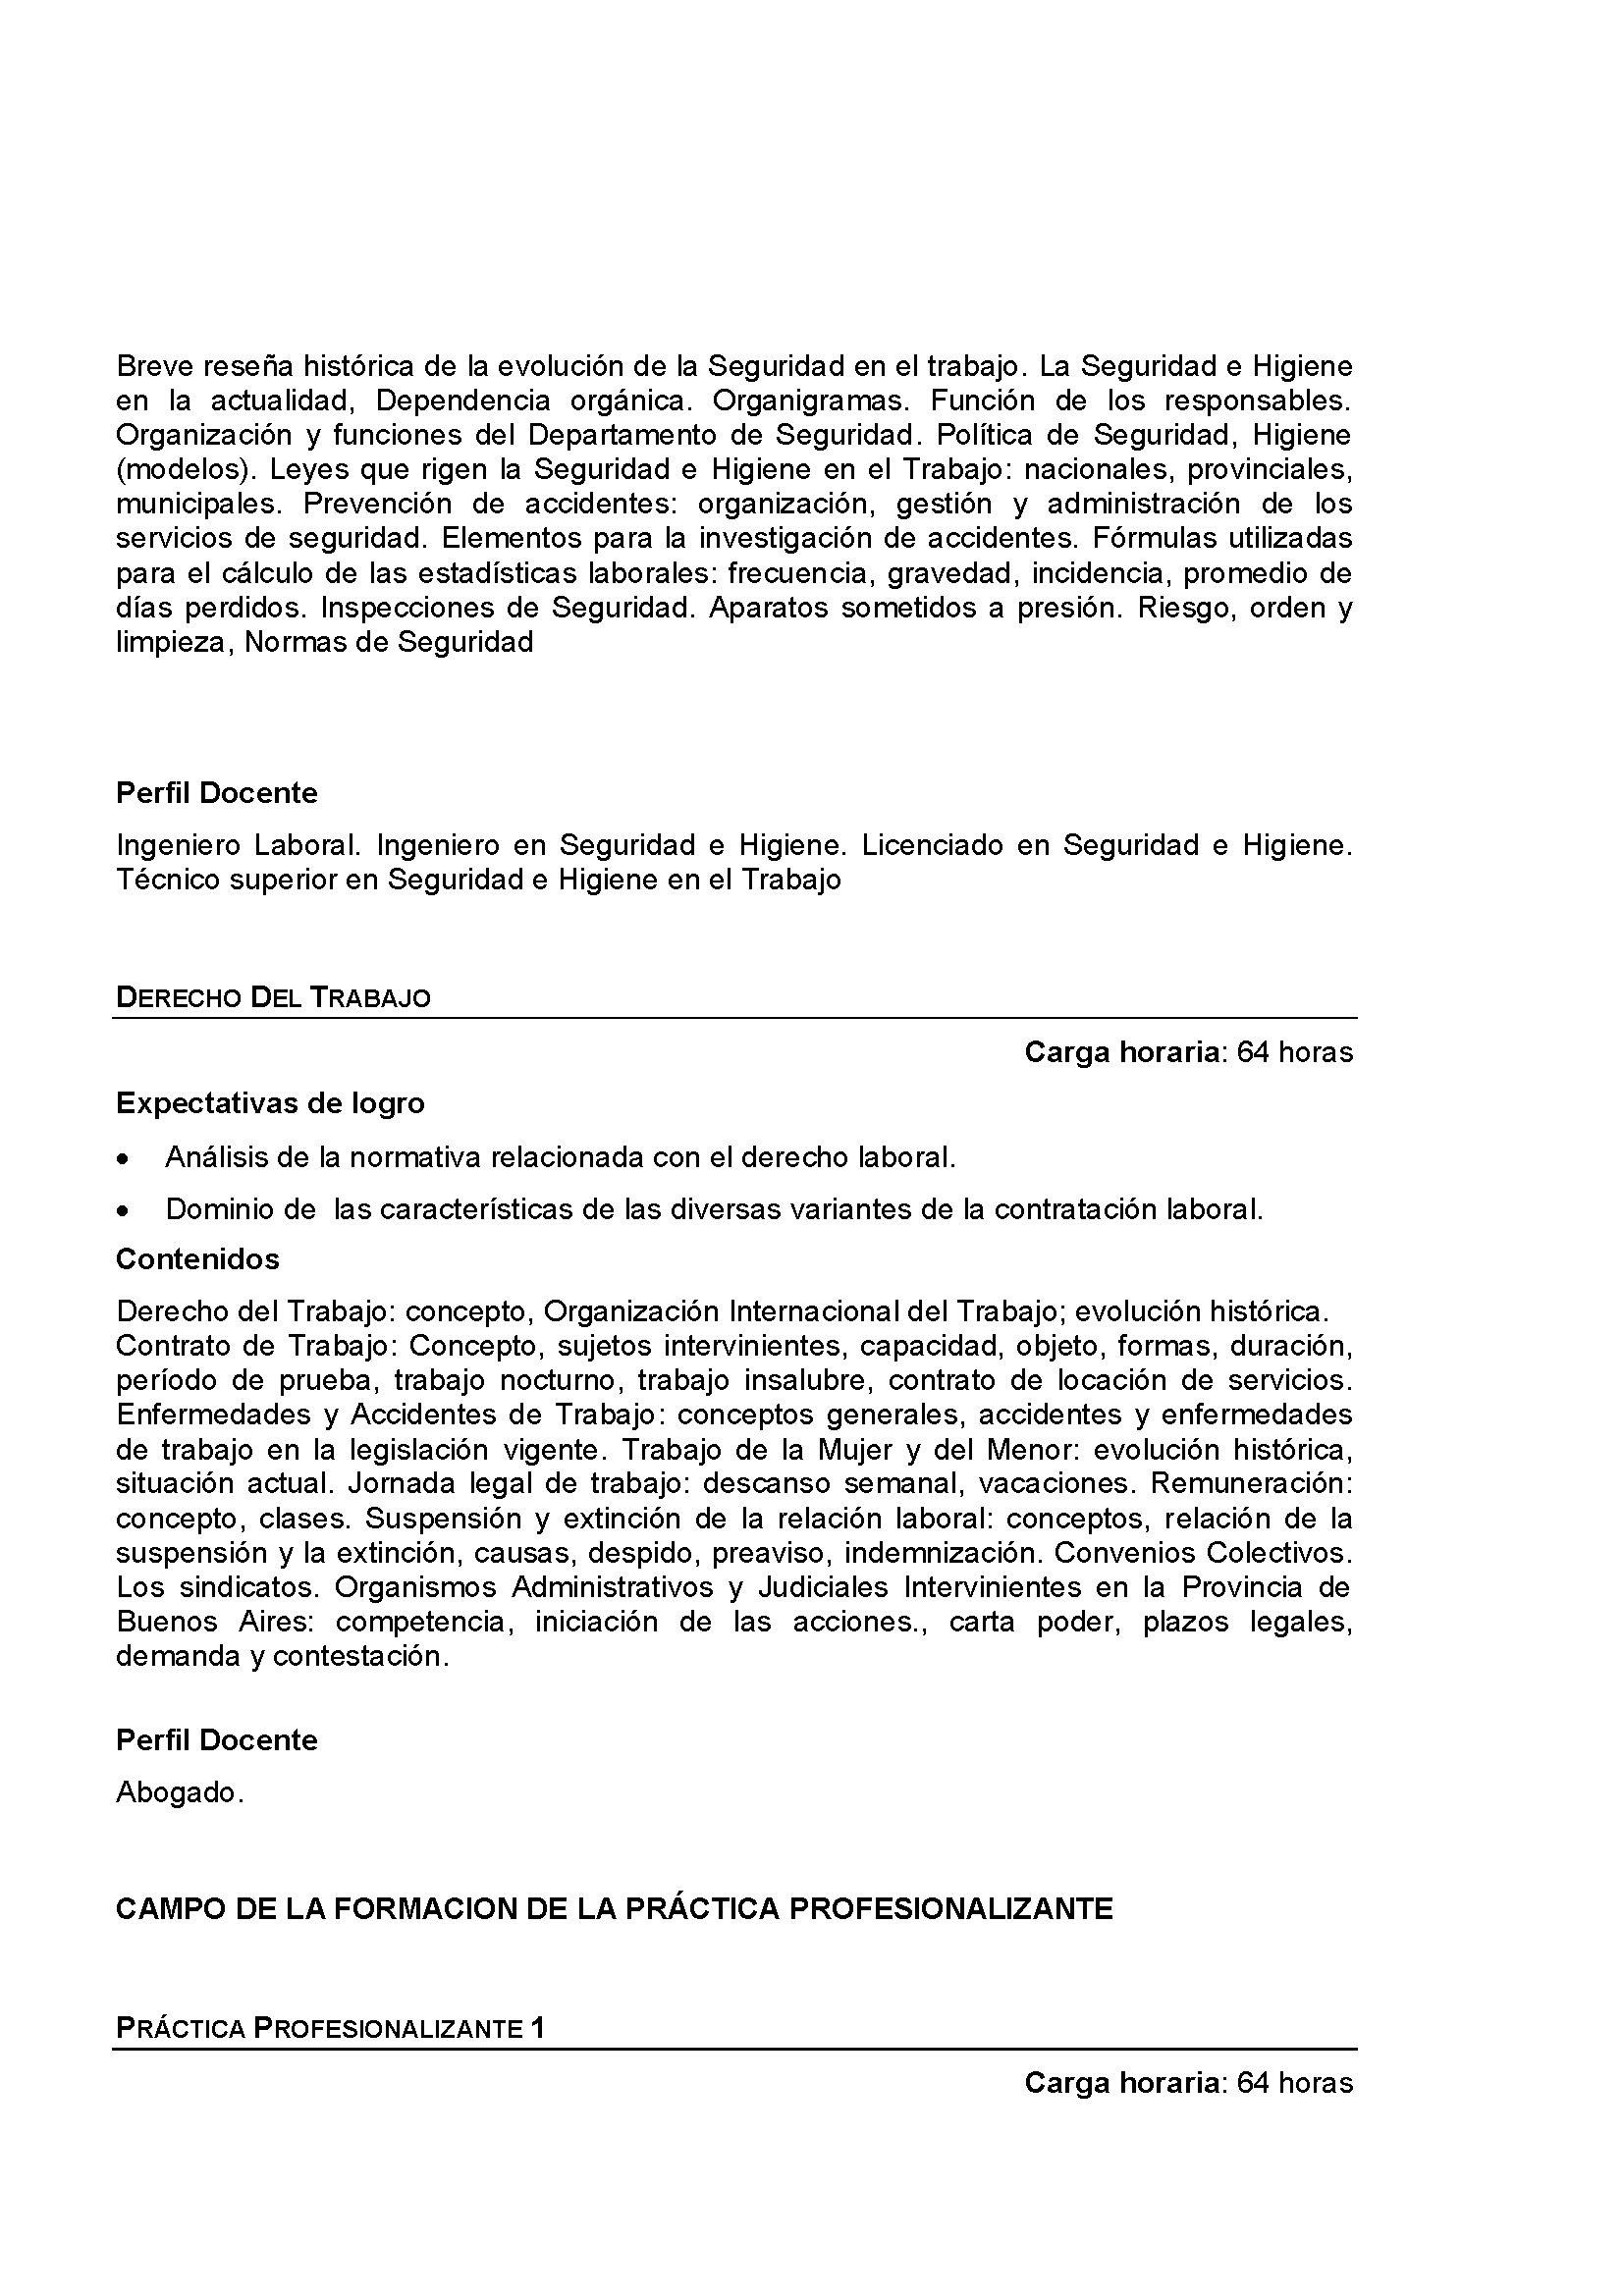 320-13 TS Seg e Hig Final (Plan Nuevo)_Page_16